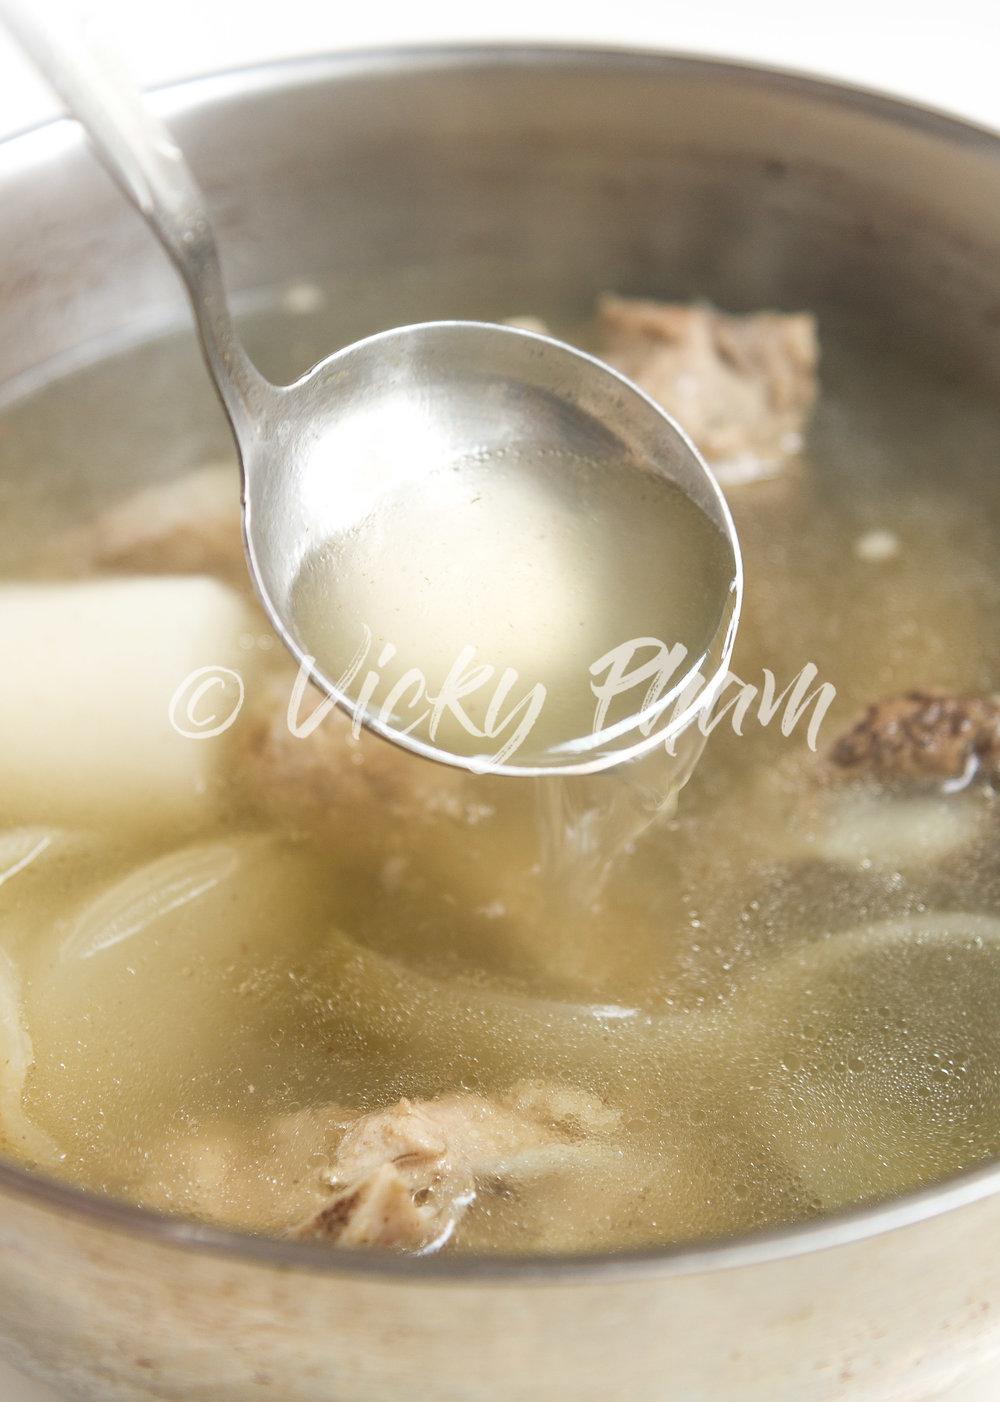 Vietnamese Homemade Pork Stock/Broth (Nuoc Leo Suon Heo) - A clean stock is a happy stock